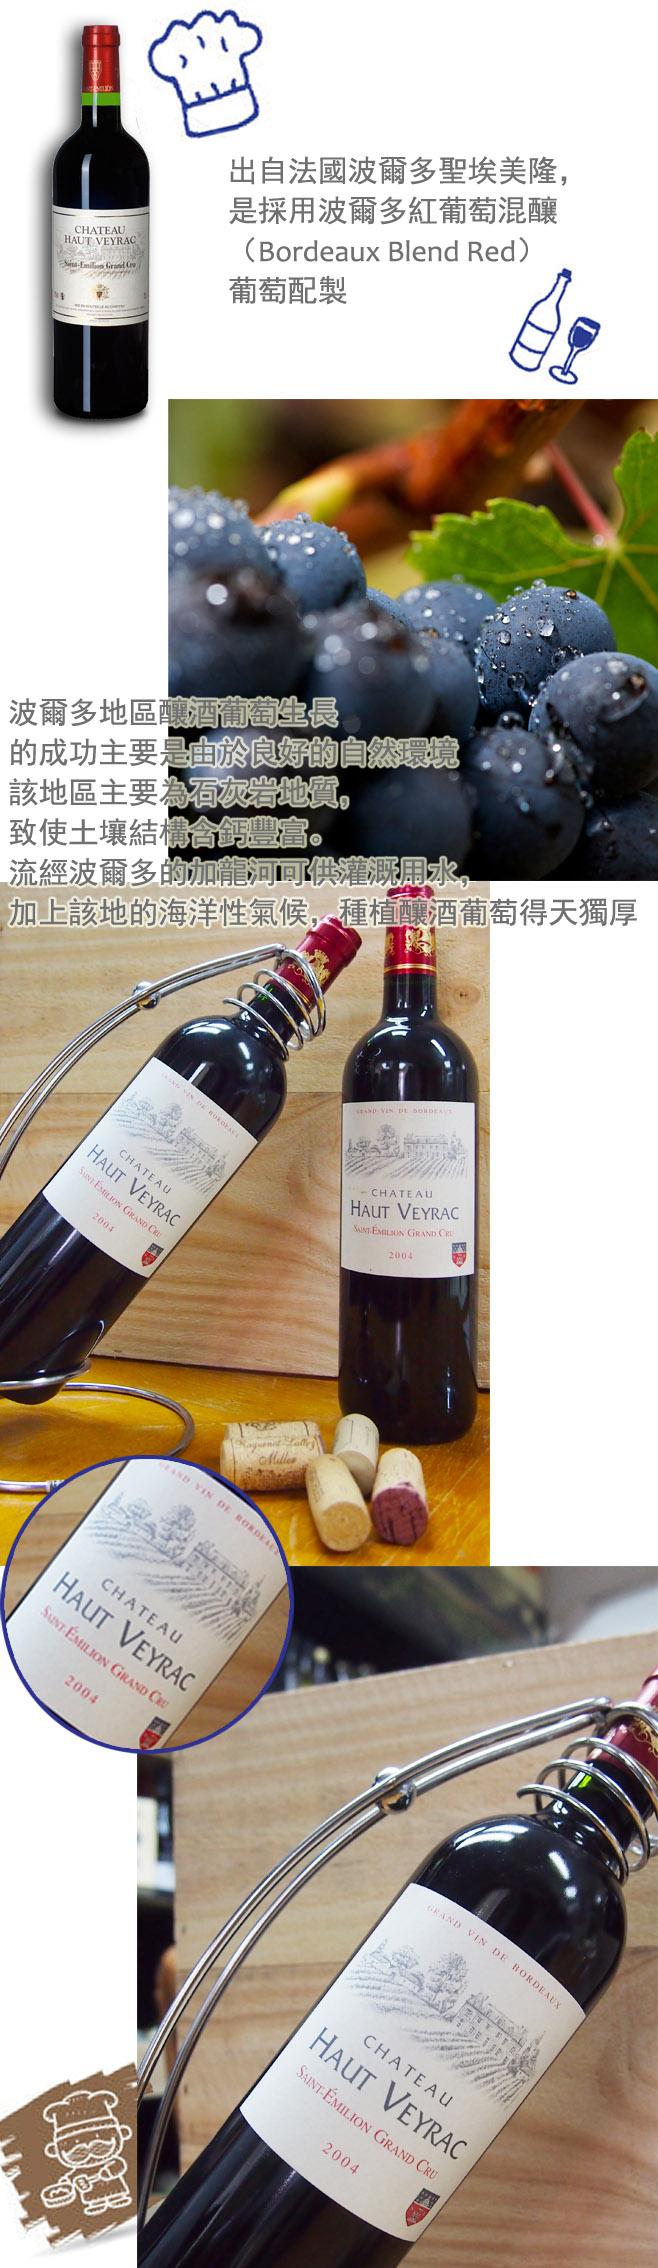 法國Chateau Haut Veyrac 2004紅酒